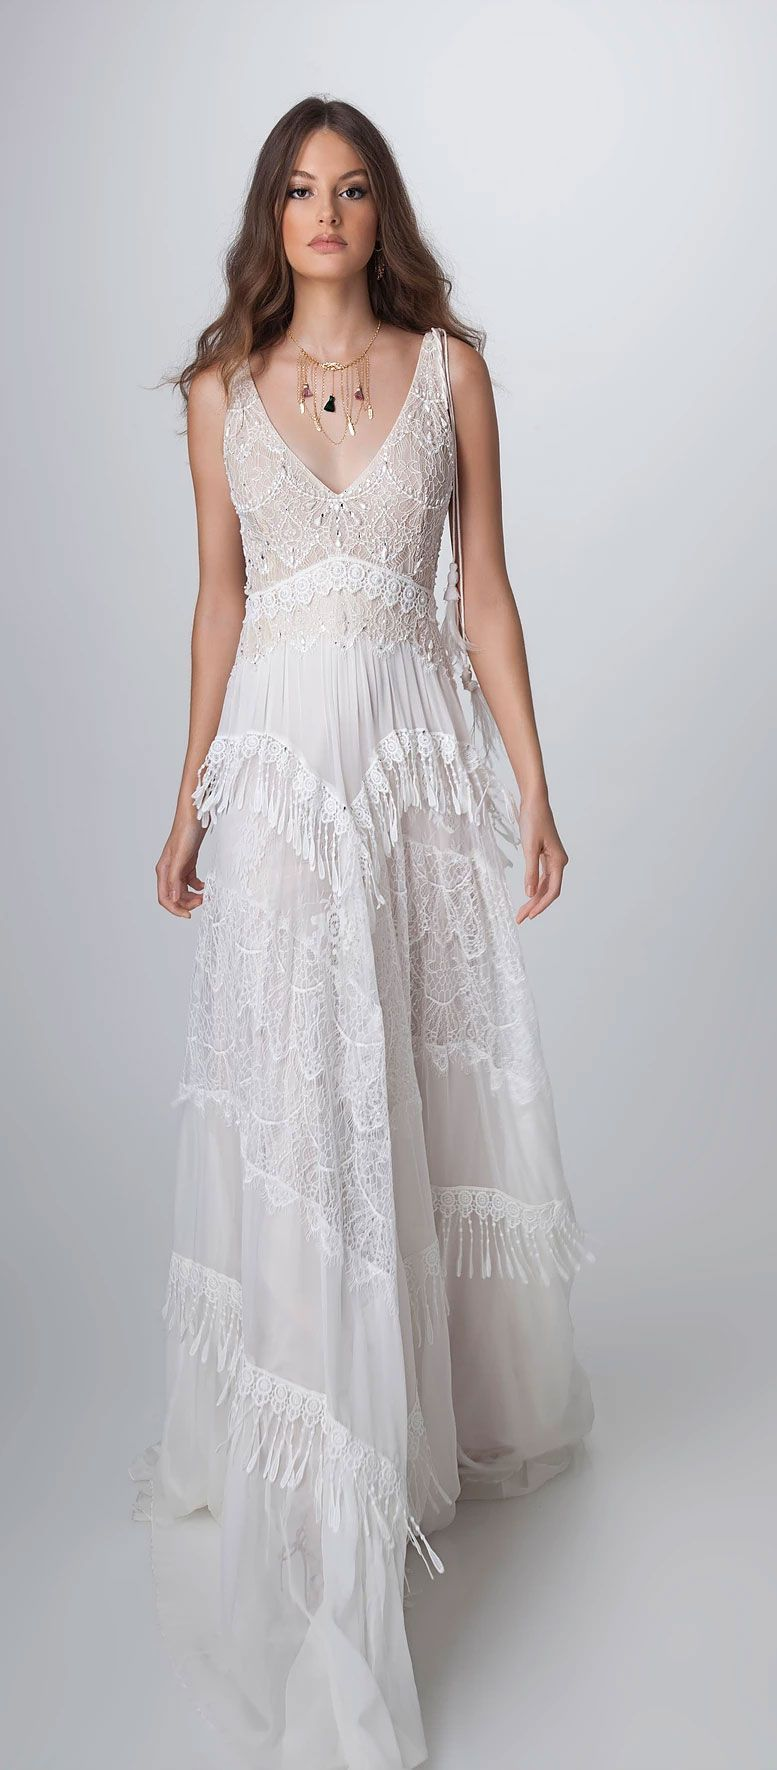 Boho chic wedding dresses with playful details boho chic